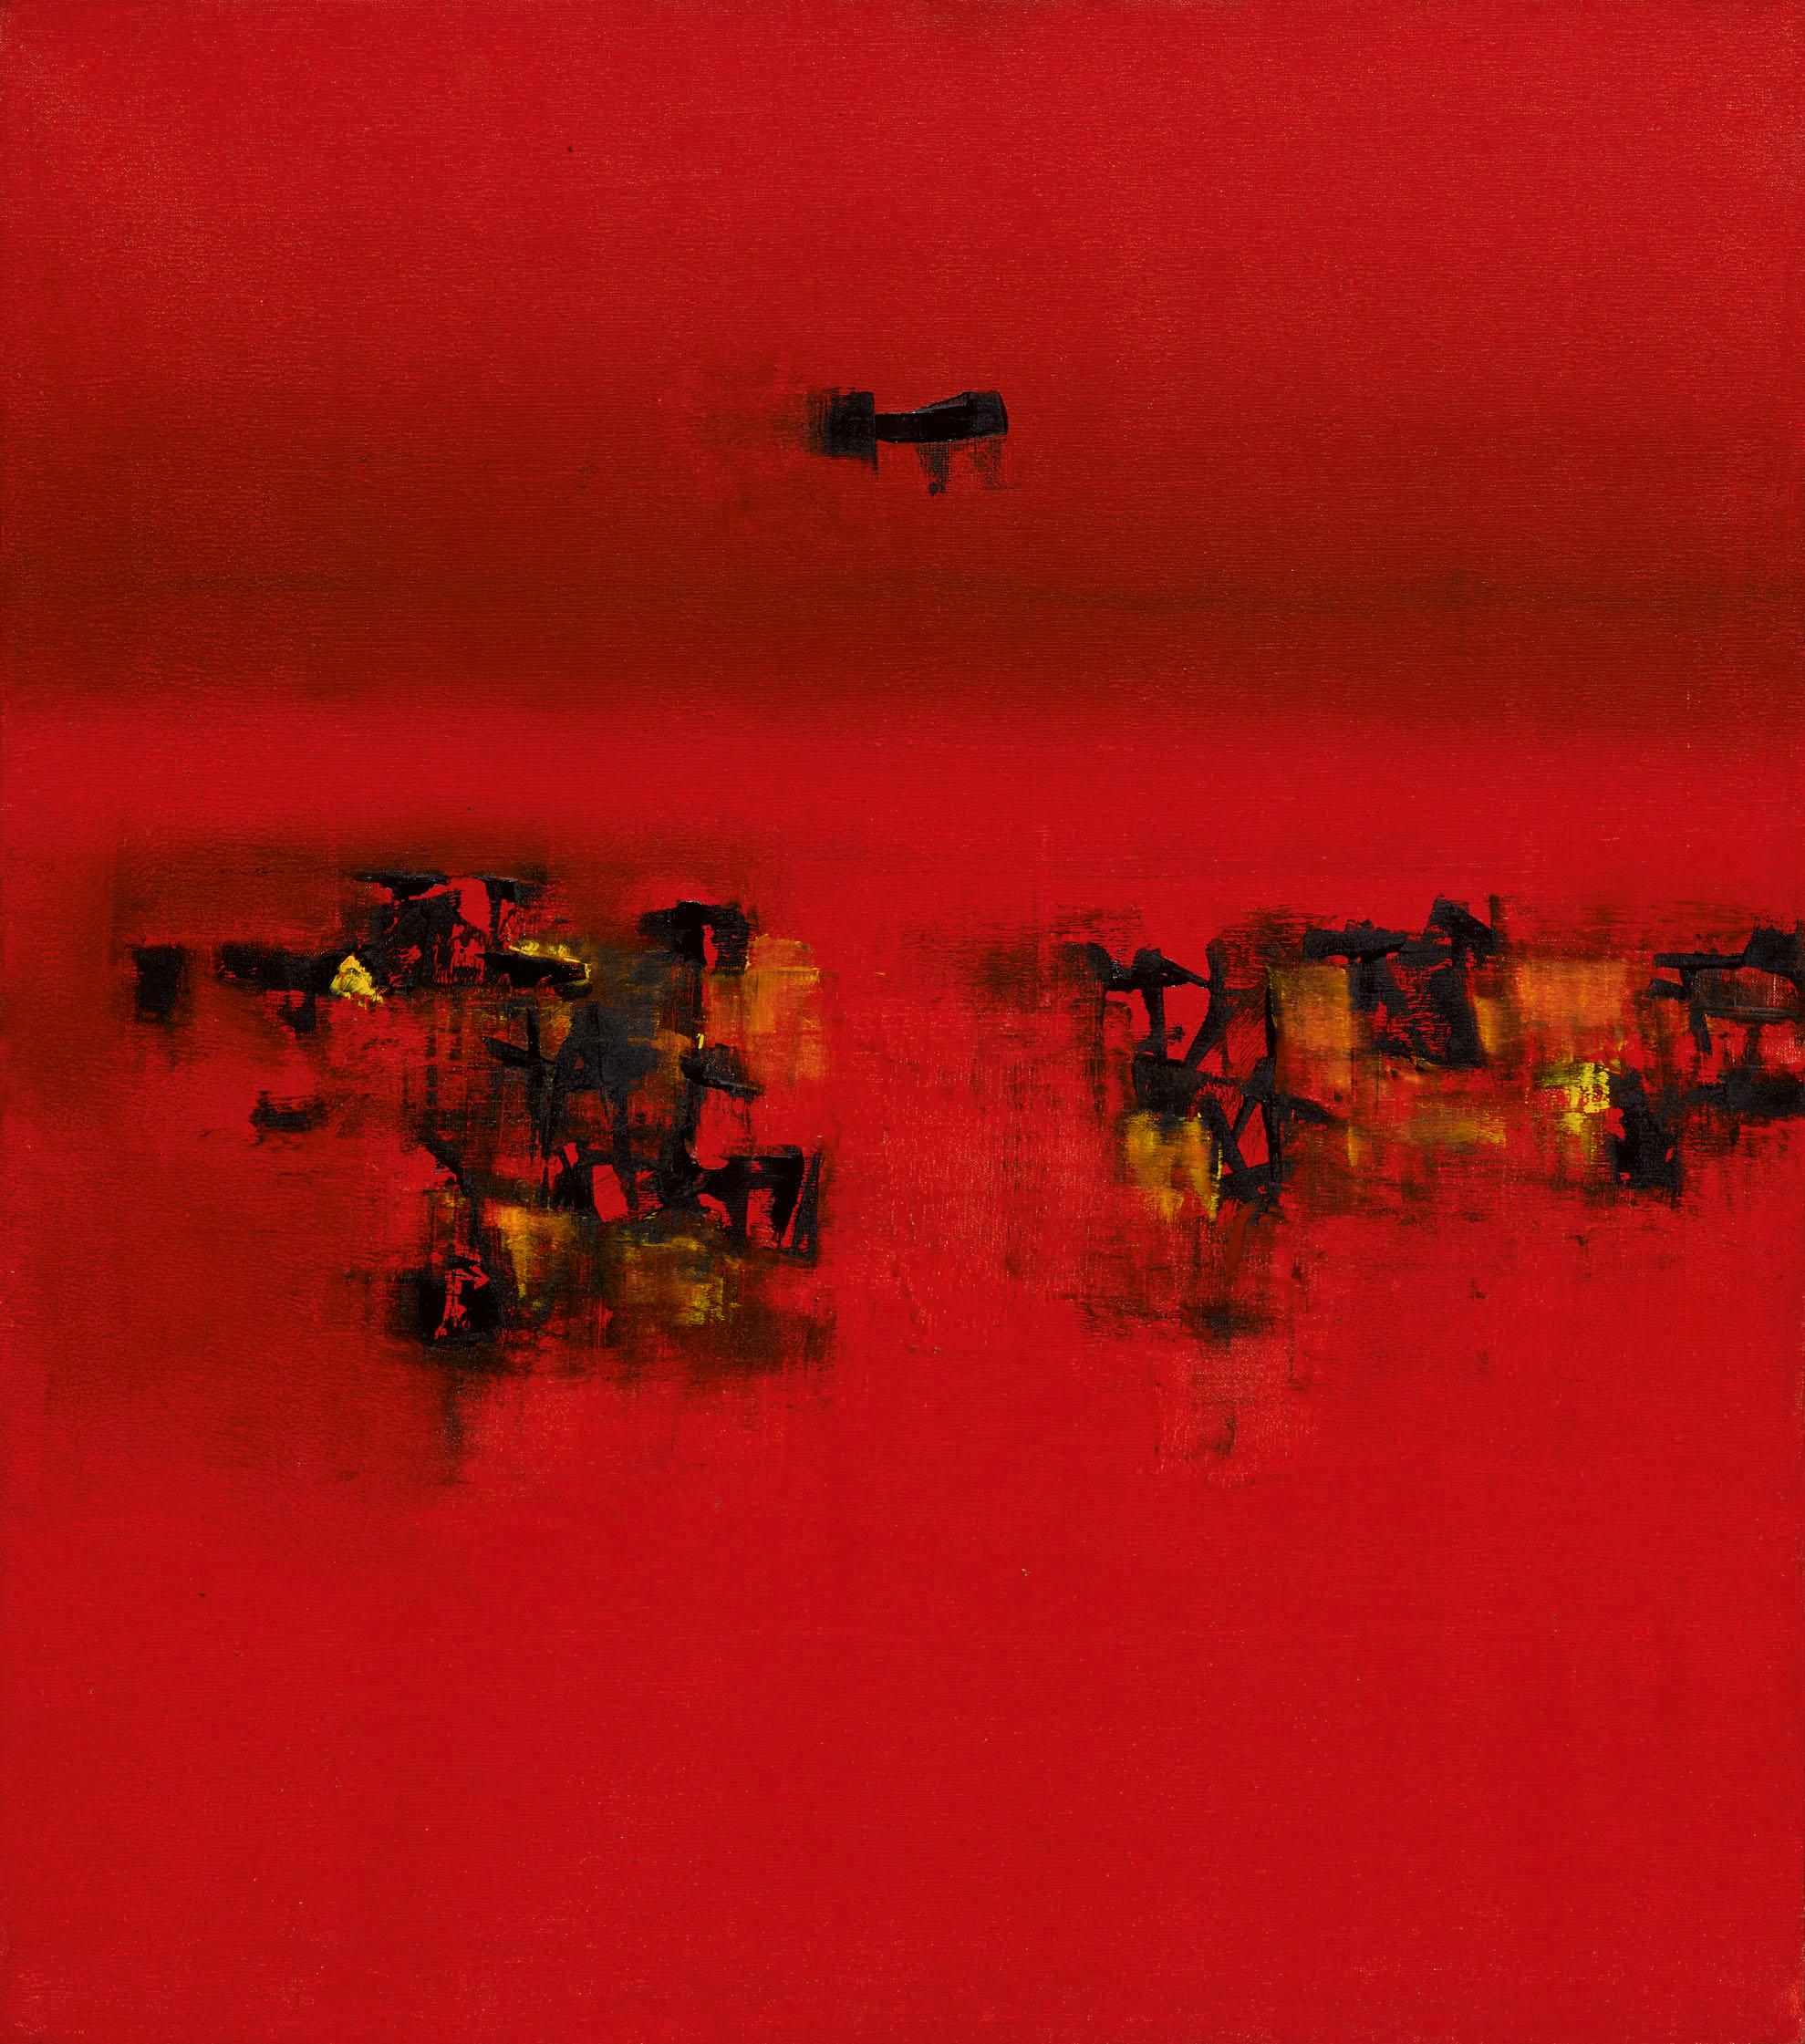 Untitled (1962) by Vasudeo S. Gaitonde